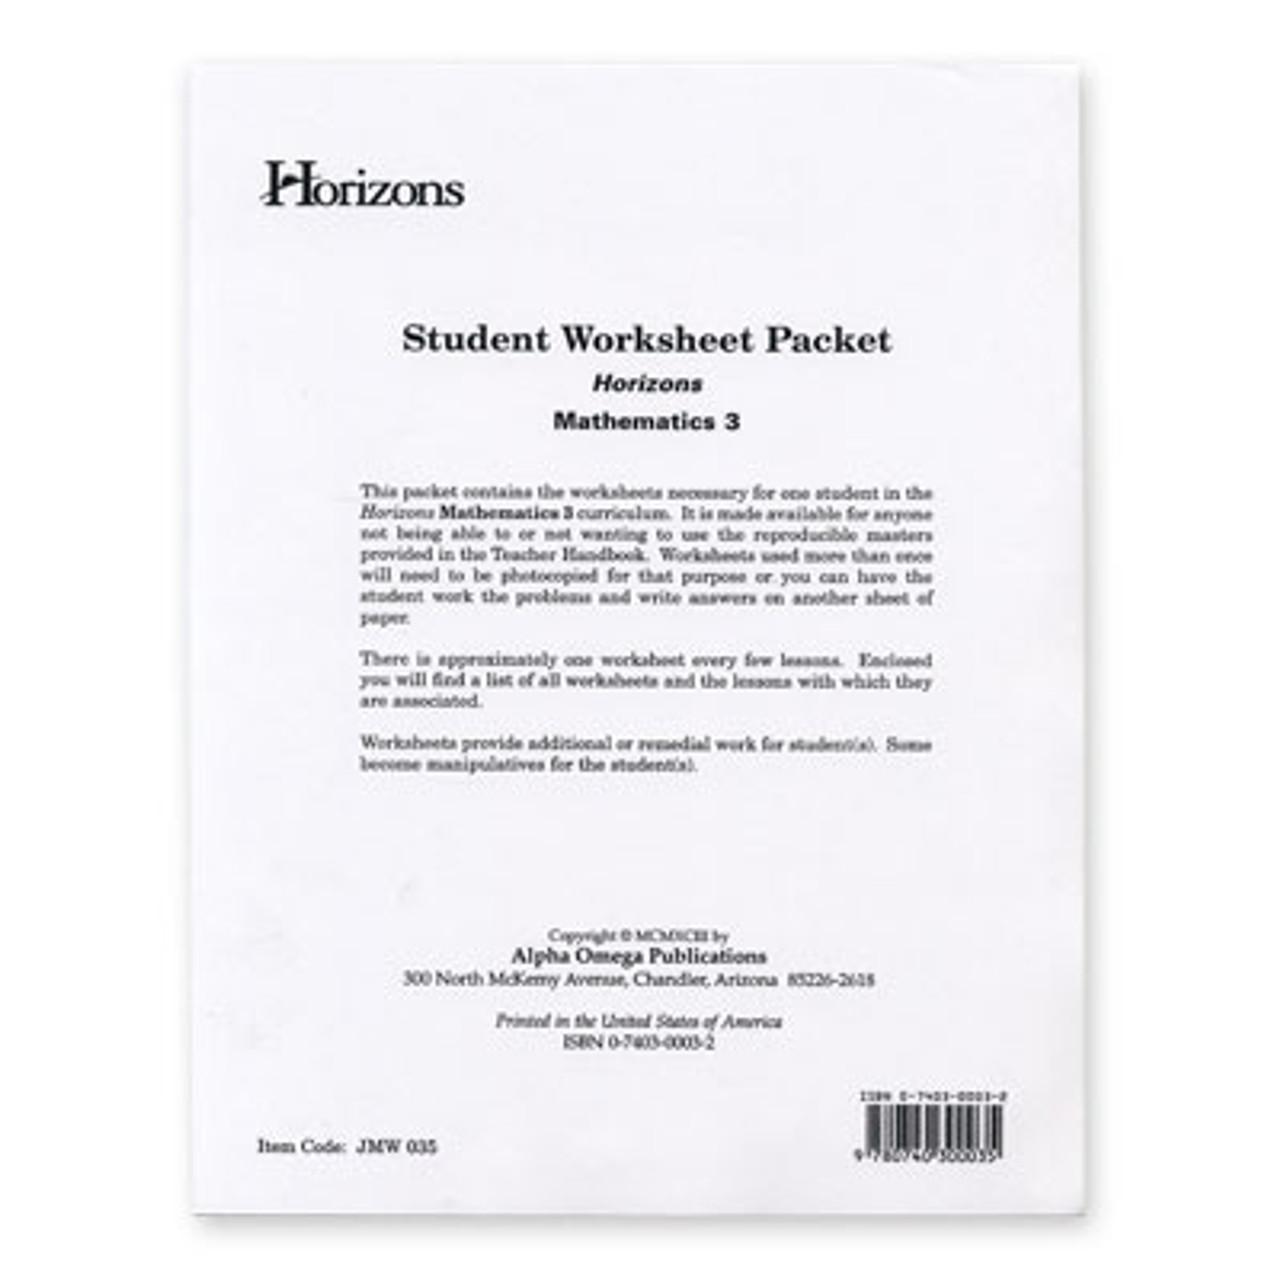 medium resolution of HORIZONS 3rd Grade Math Student Worksheet Packet - All Things New